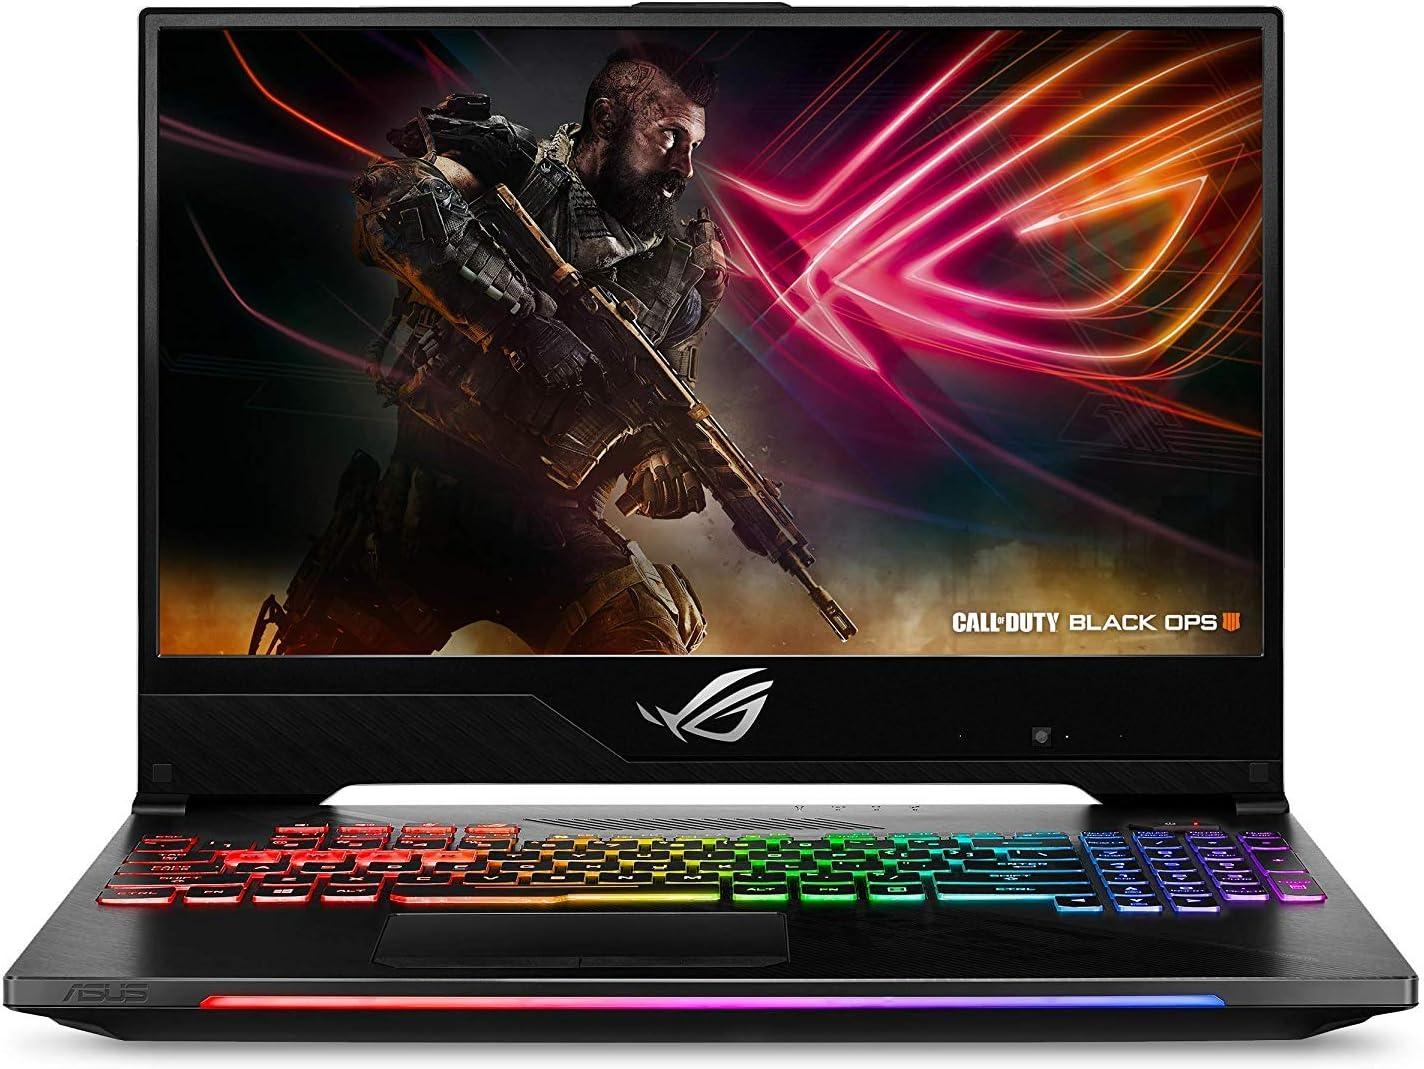 "2019 ASUS ROG Strix Hero II 15.6"" FHD Gaming Laptop, Intel 6-Core i7-8750H, 16GB RAM, 128GB SSD Boot + 1TB HDD, NVIDIA GeForce GTX 1060 6GB GDDR5, Backlit Keyboard, Windows 10"